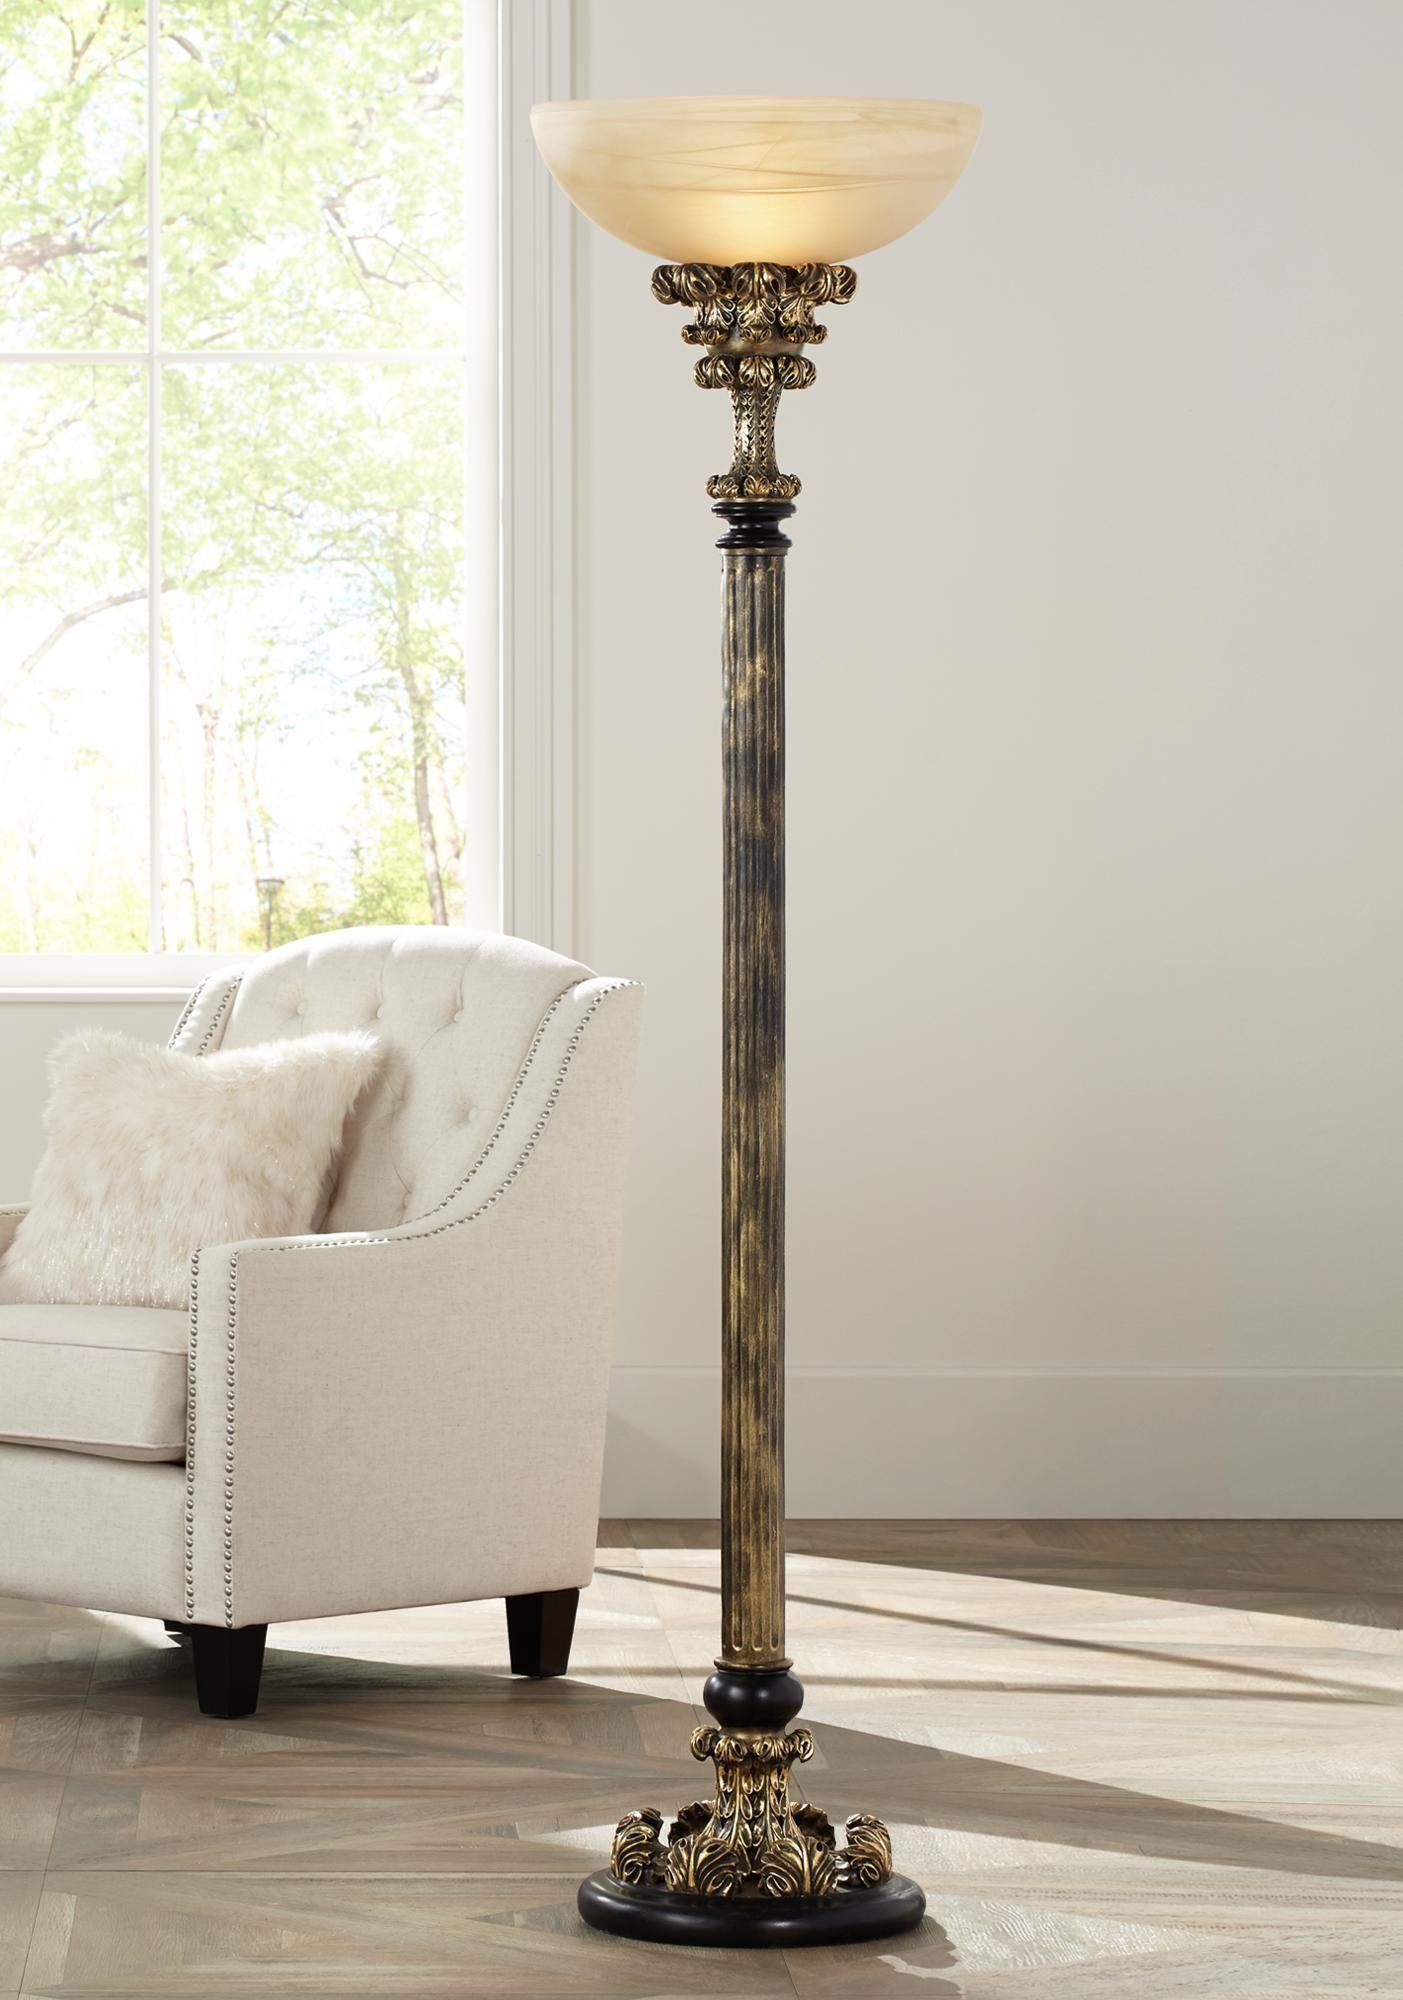 Floor Lamps Florencio Antique Gold Torchiere Floor Lamp Floor Lamps Living Room Torchiere Floor Lamp Lamps Living Room